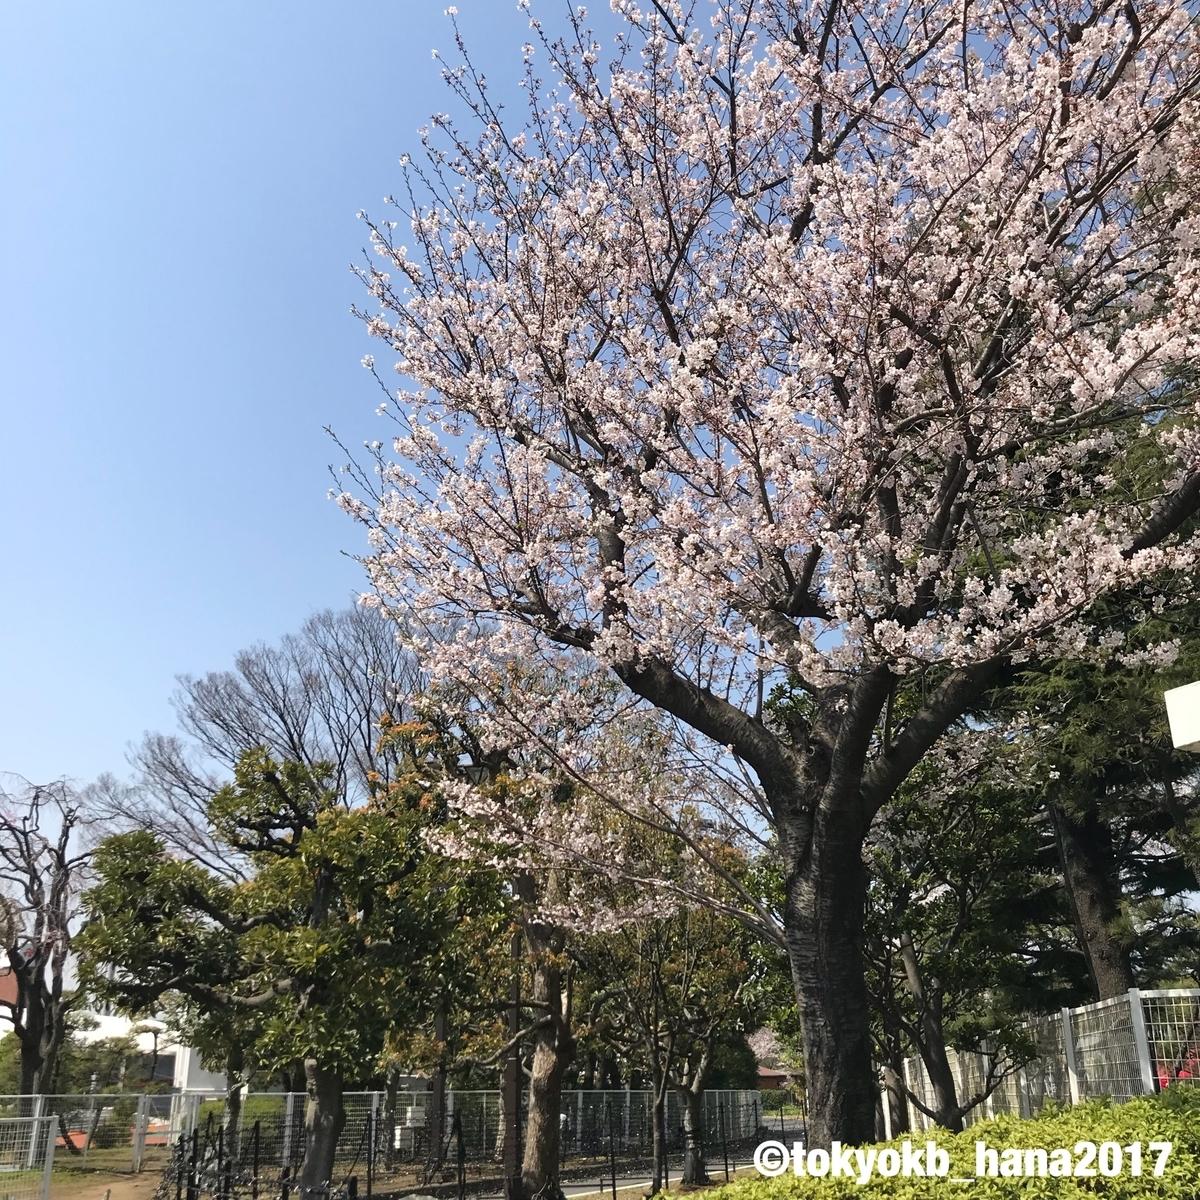 f:id:tokyokb_hana2017:20190406152841j:plain